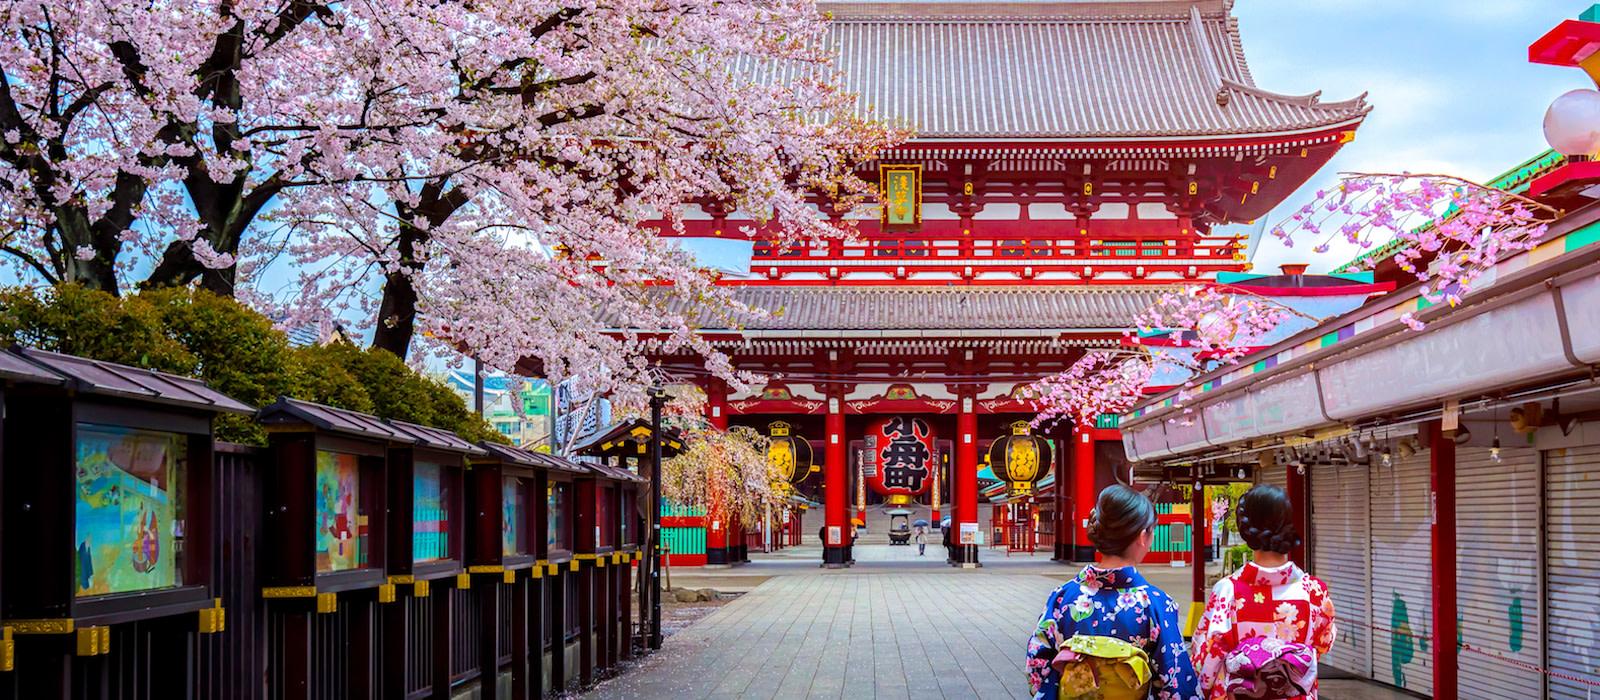 Japan, ganz klassisch: Tokio & Kyoto Urlaub 1